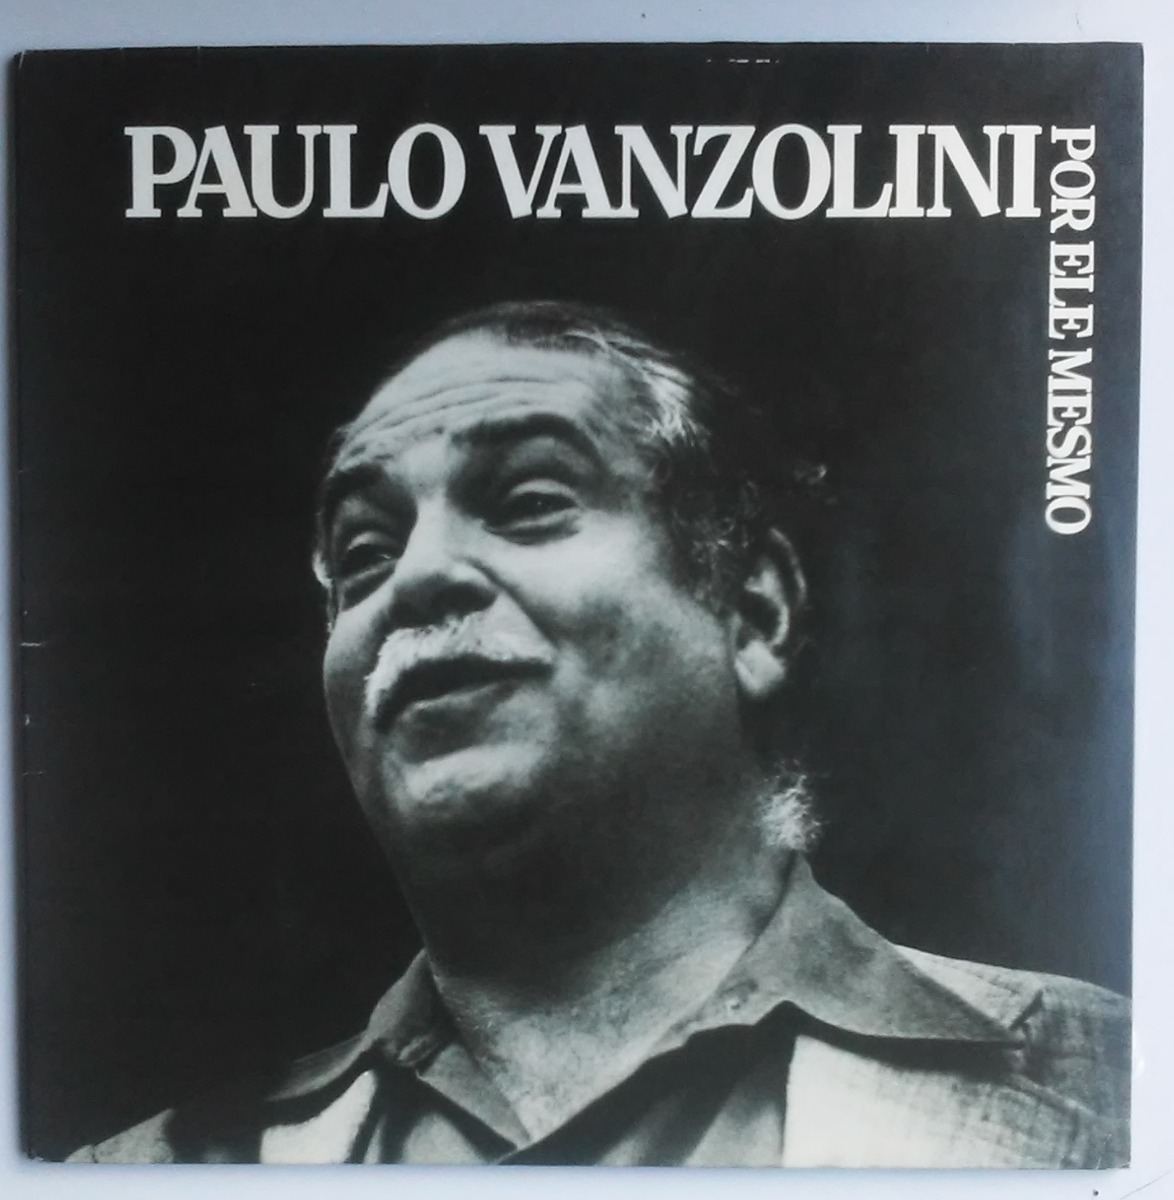 Resultado de imagem para Paulo vanzolini